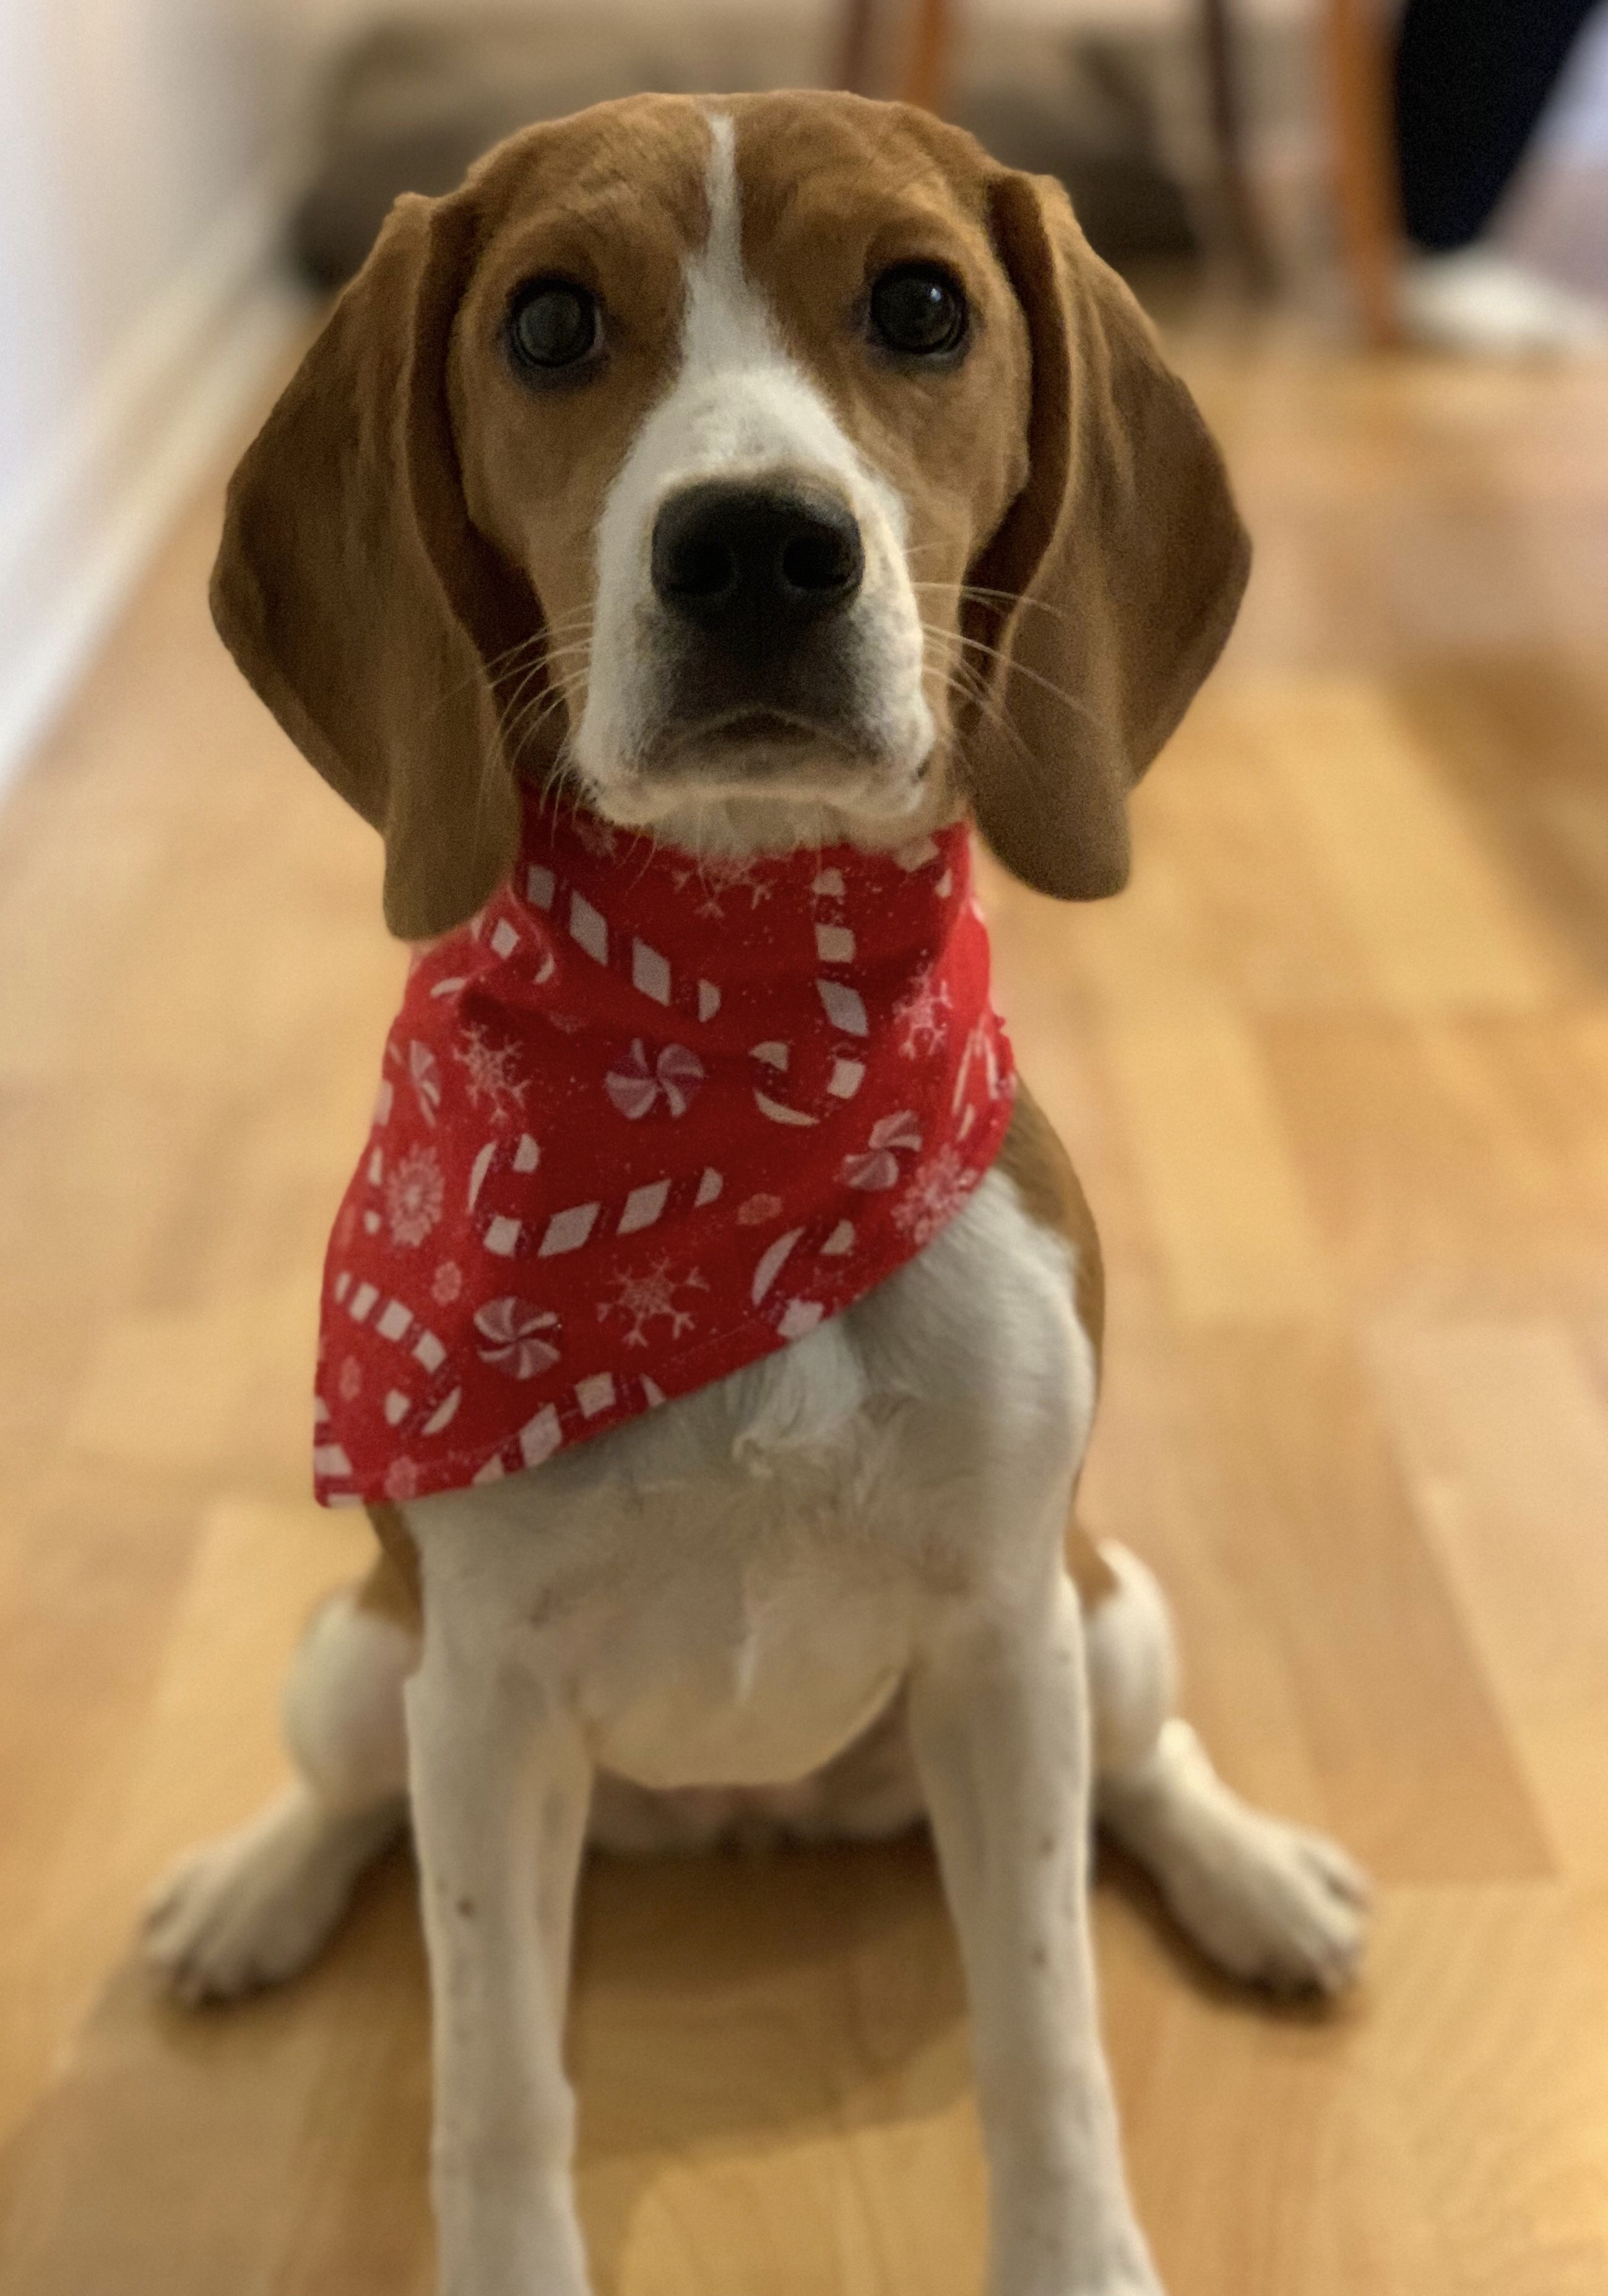 Beagle Dog Breed Information Beagle Dog Breed Beagle Beagle Puppy